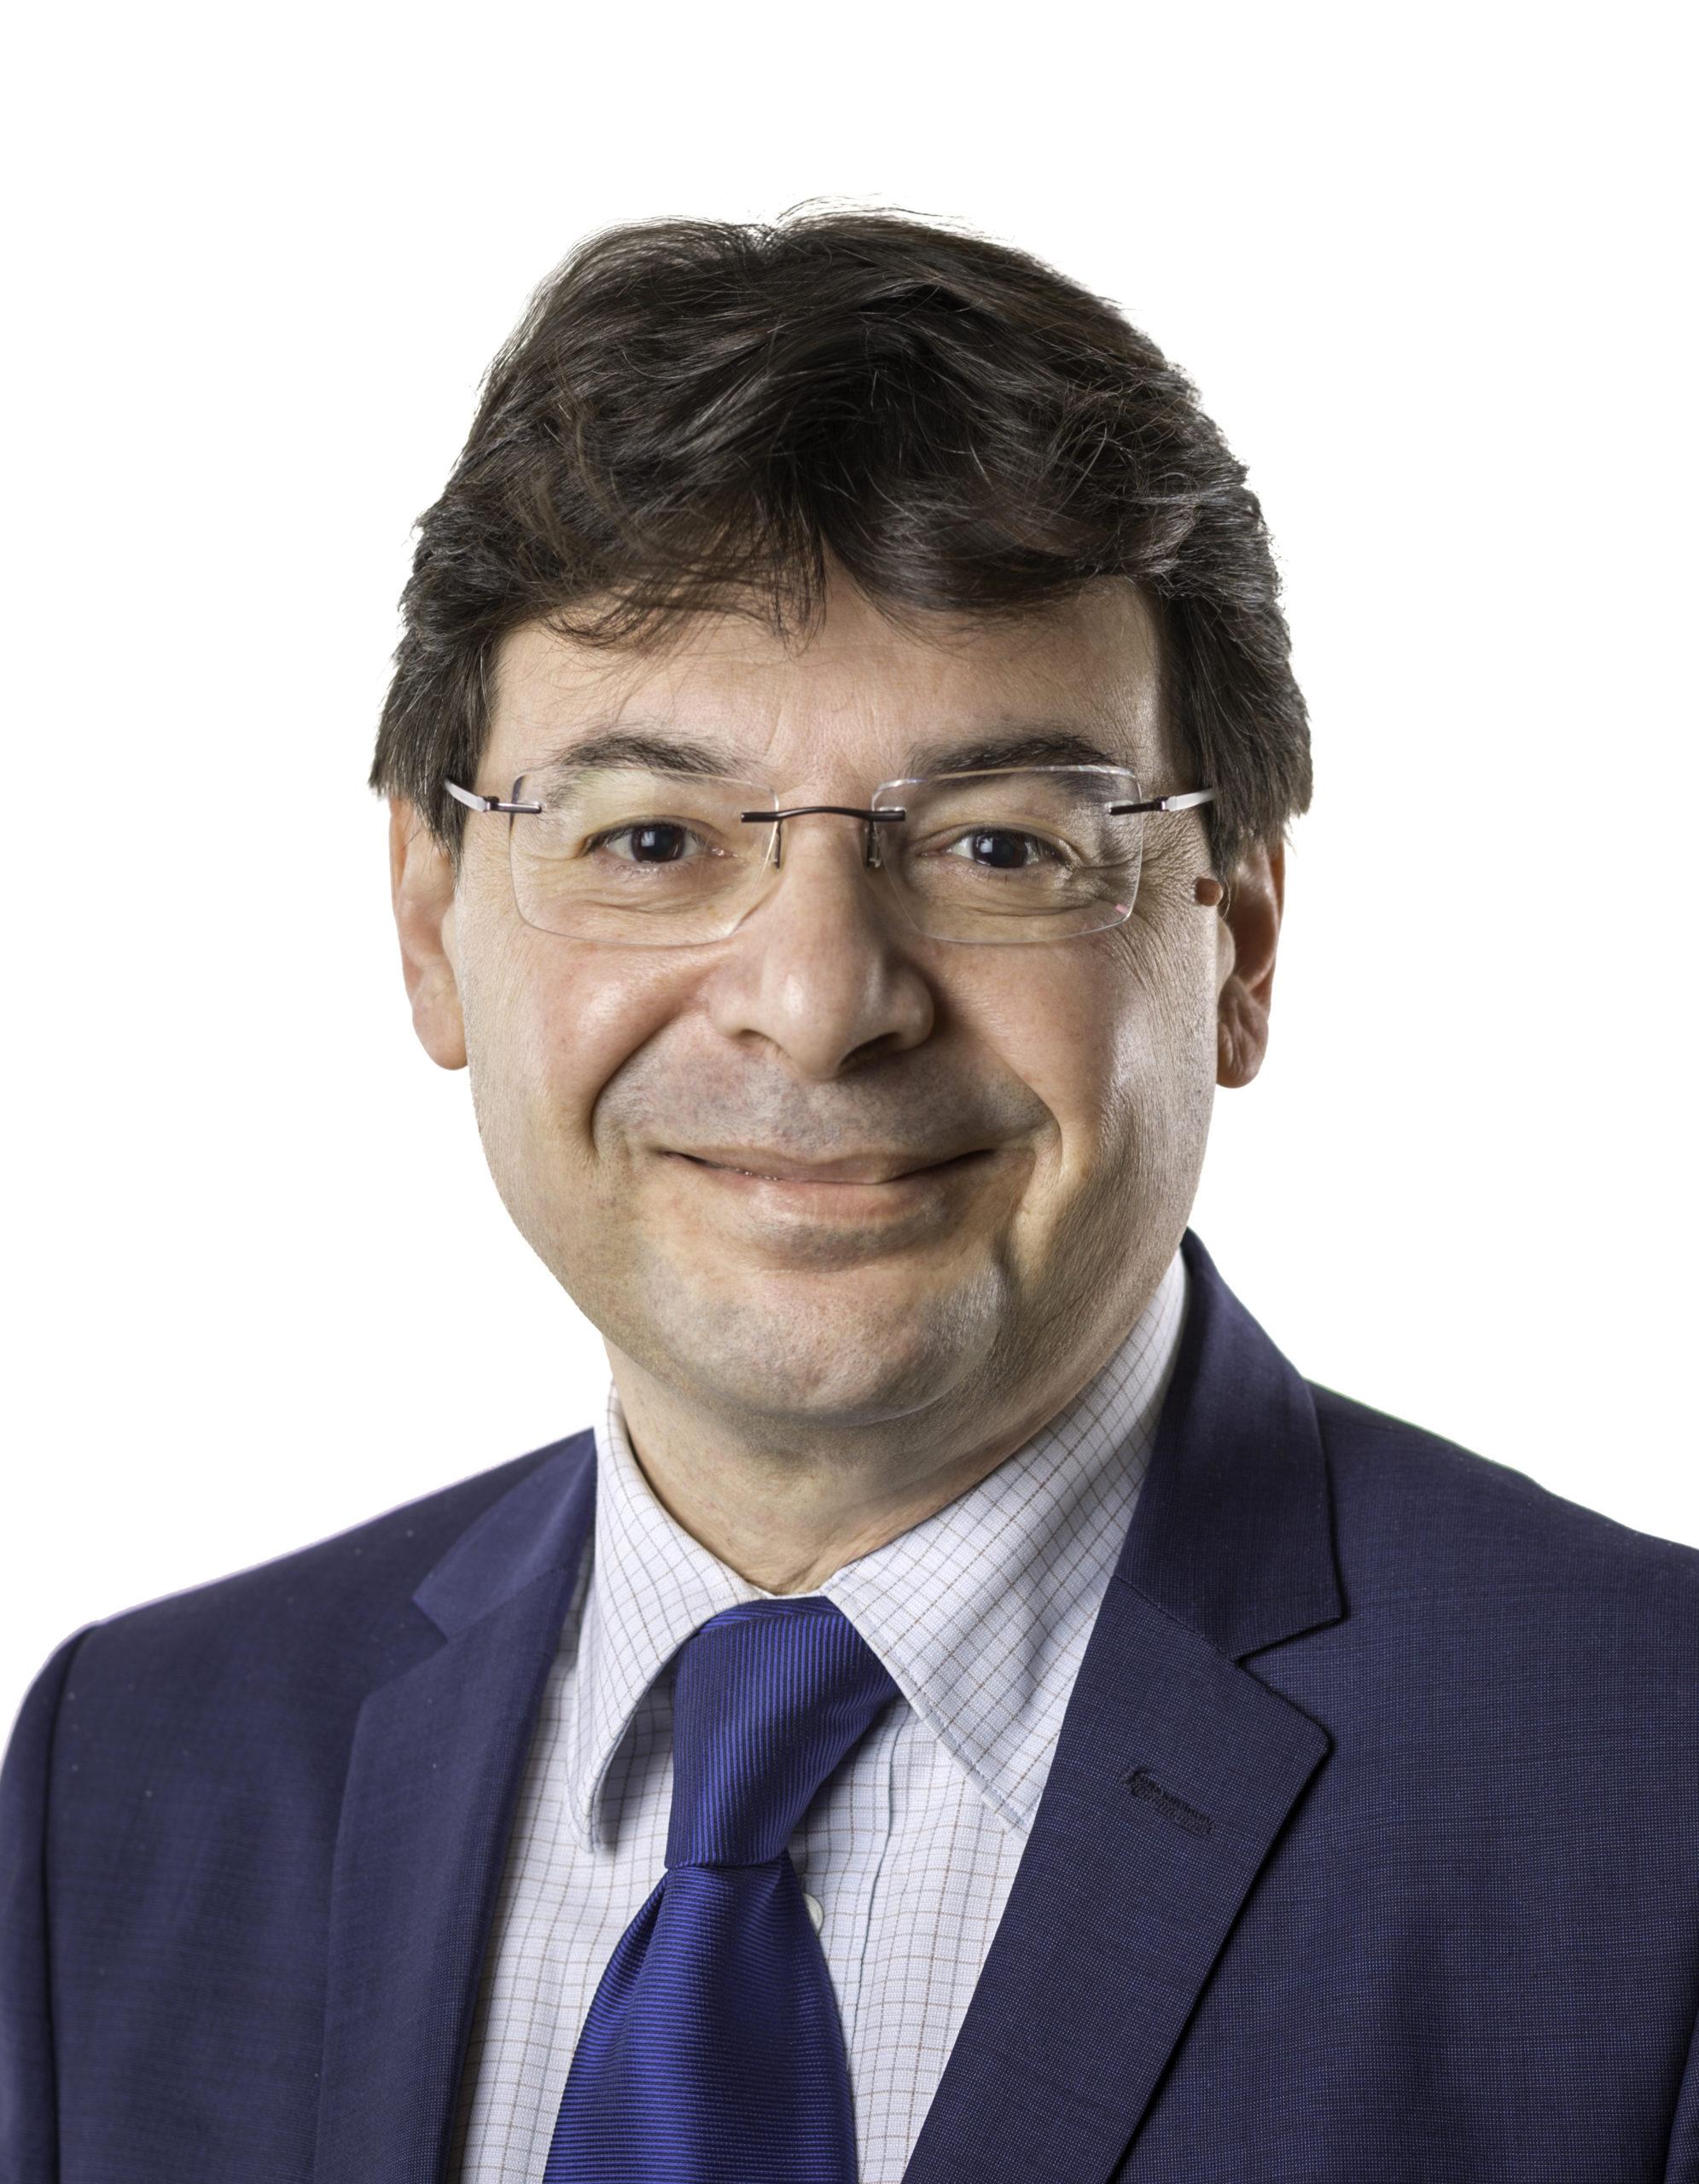 Mehdi Bouzekri Talent Manager